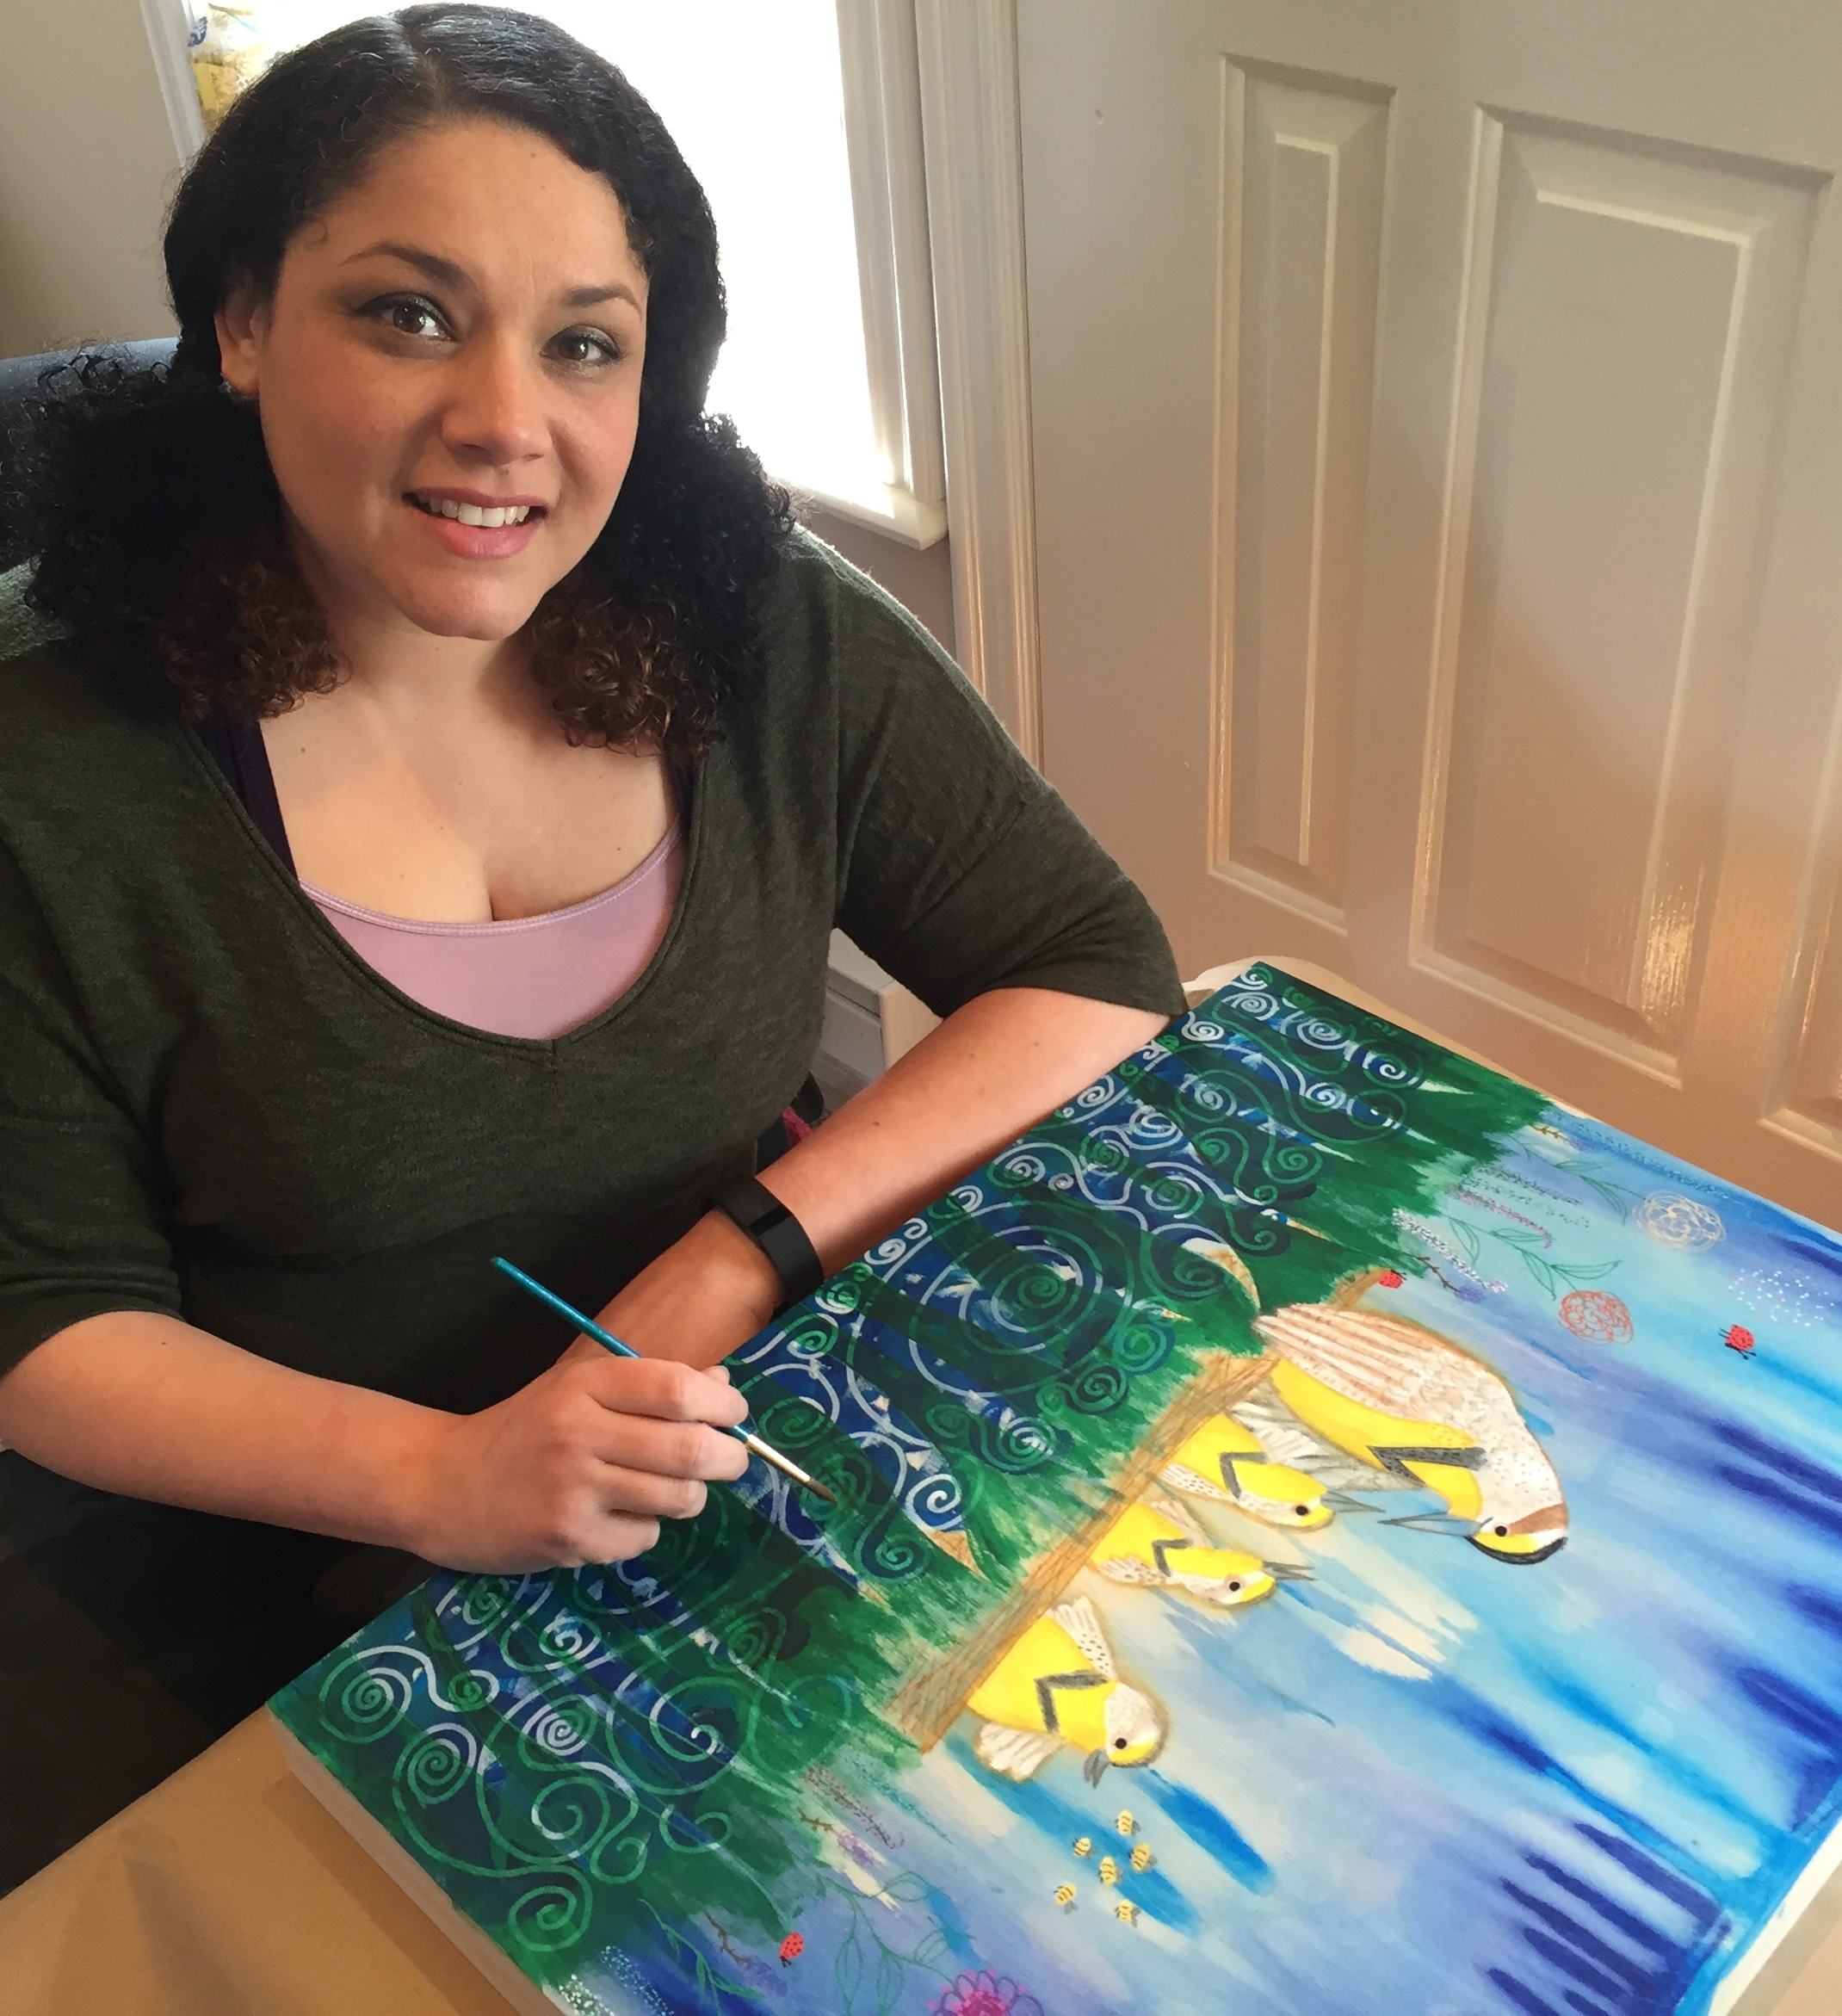 Bethany Handfield painting & Smiling 2.jpg